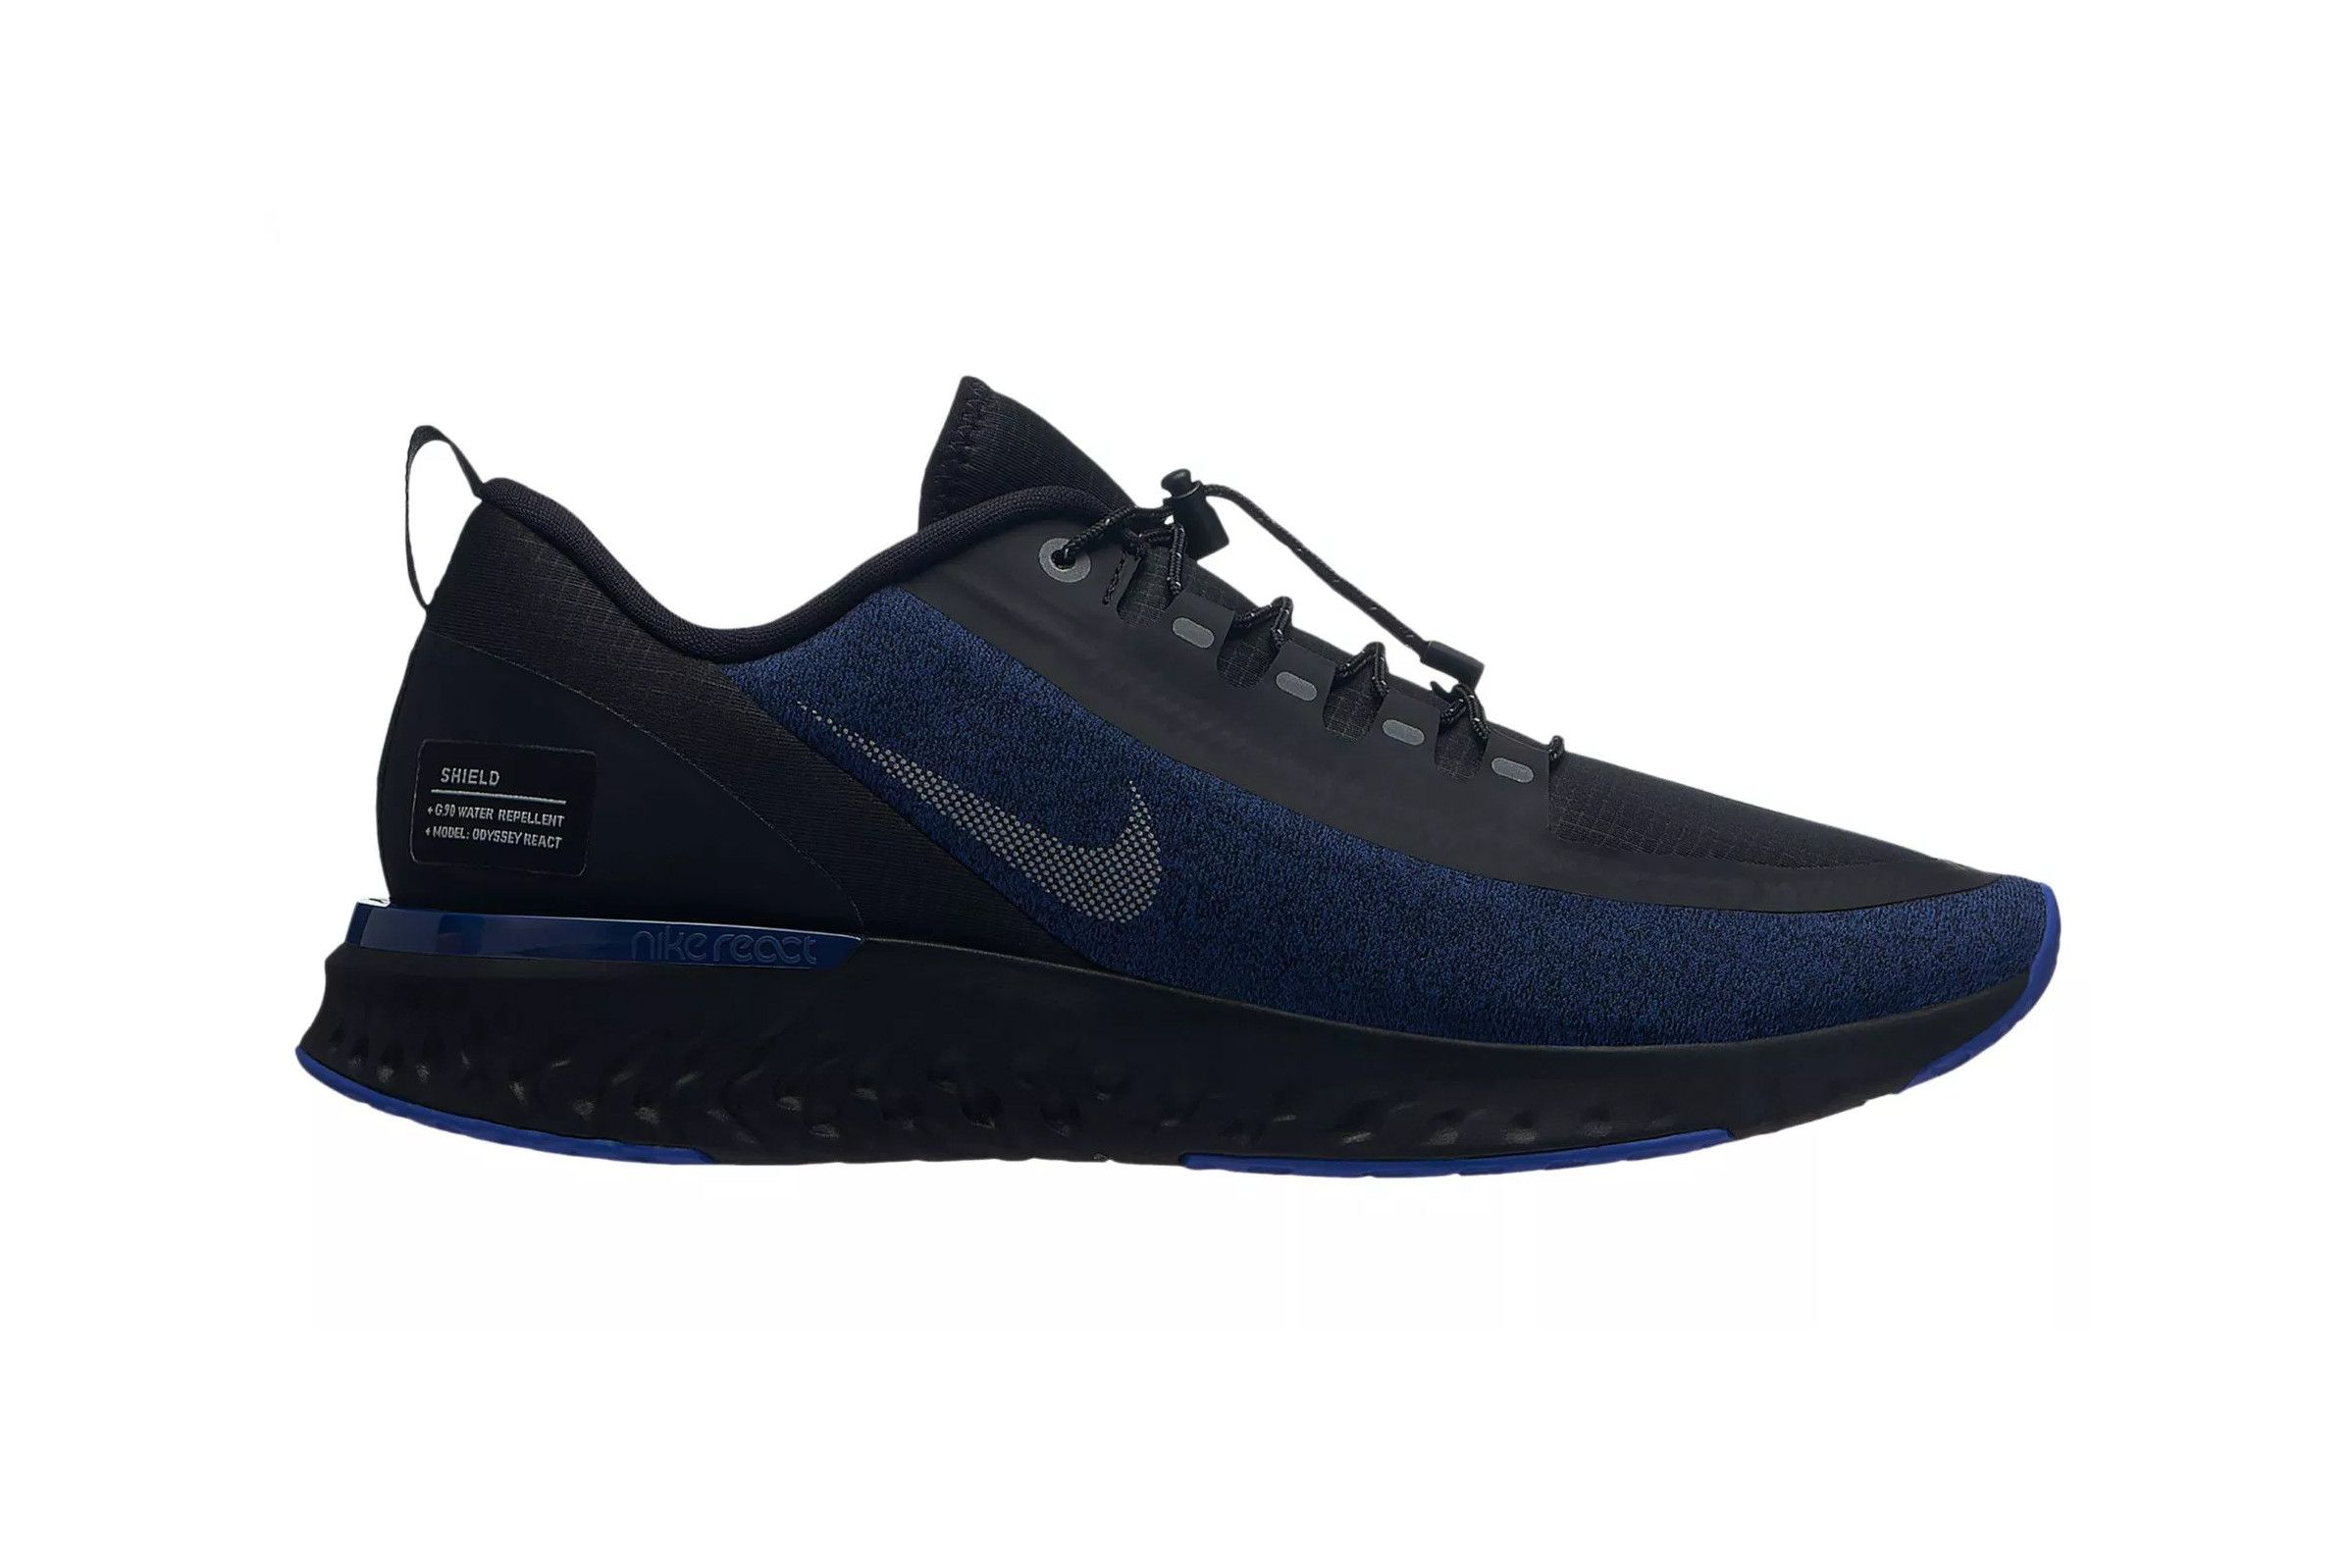 reputable site 2cb8d 2636c 風暴後裝備-Nike 全新防水跑鞋Odyssey React Shield